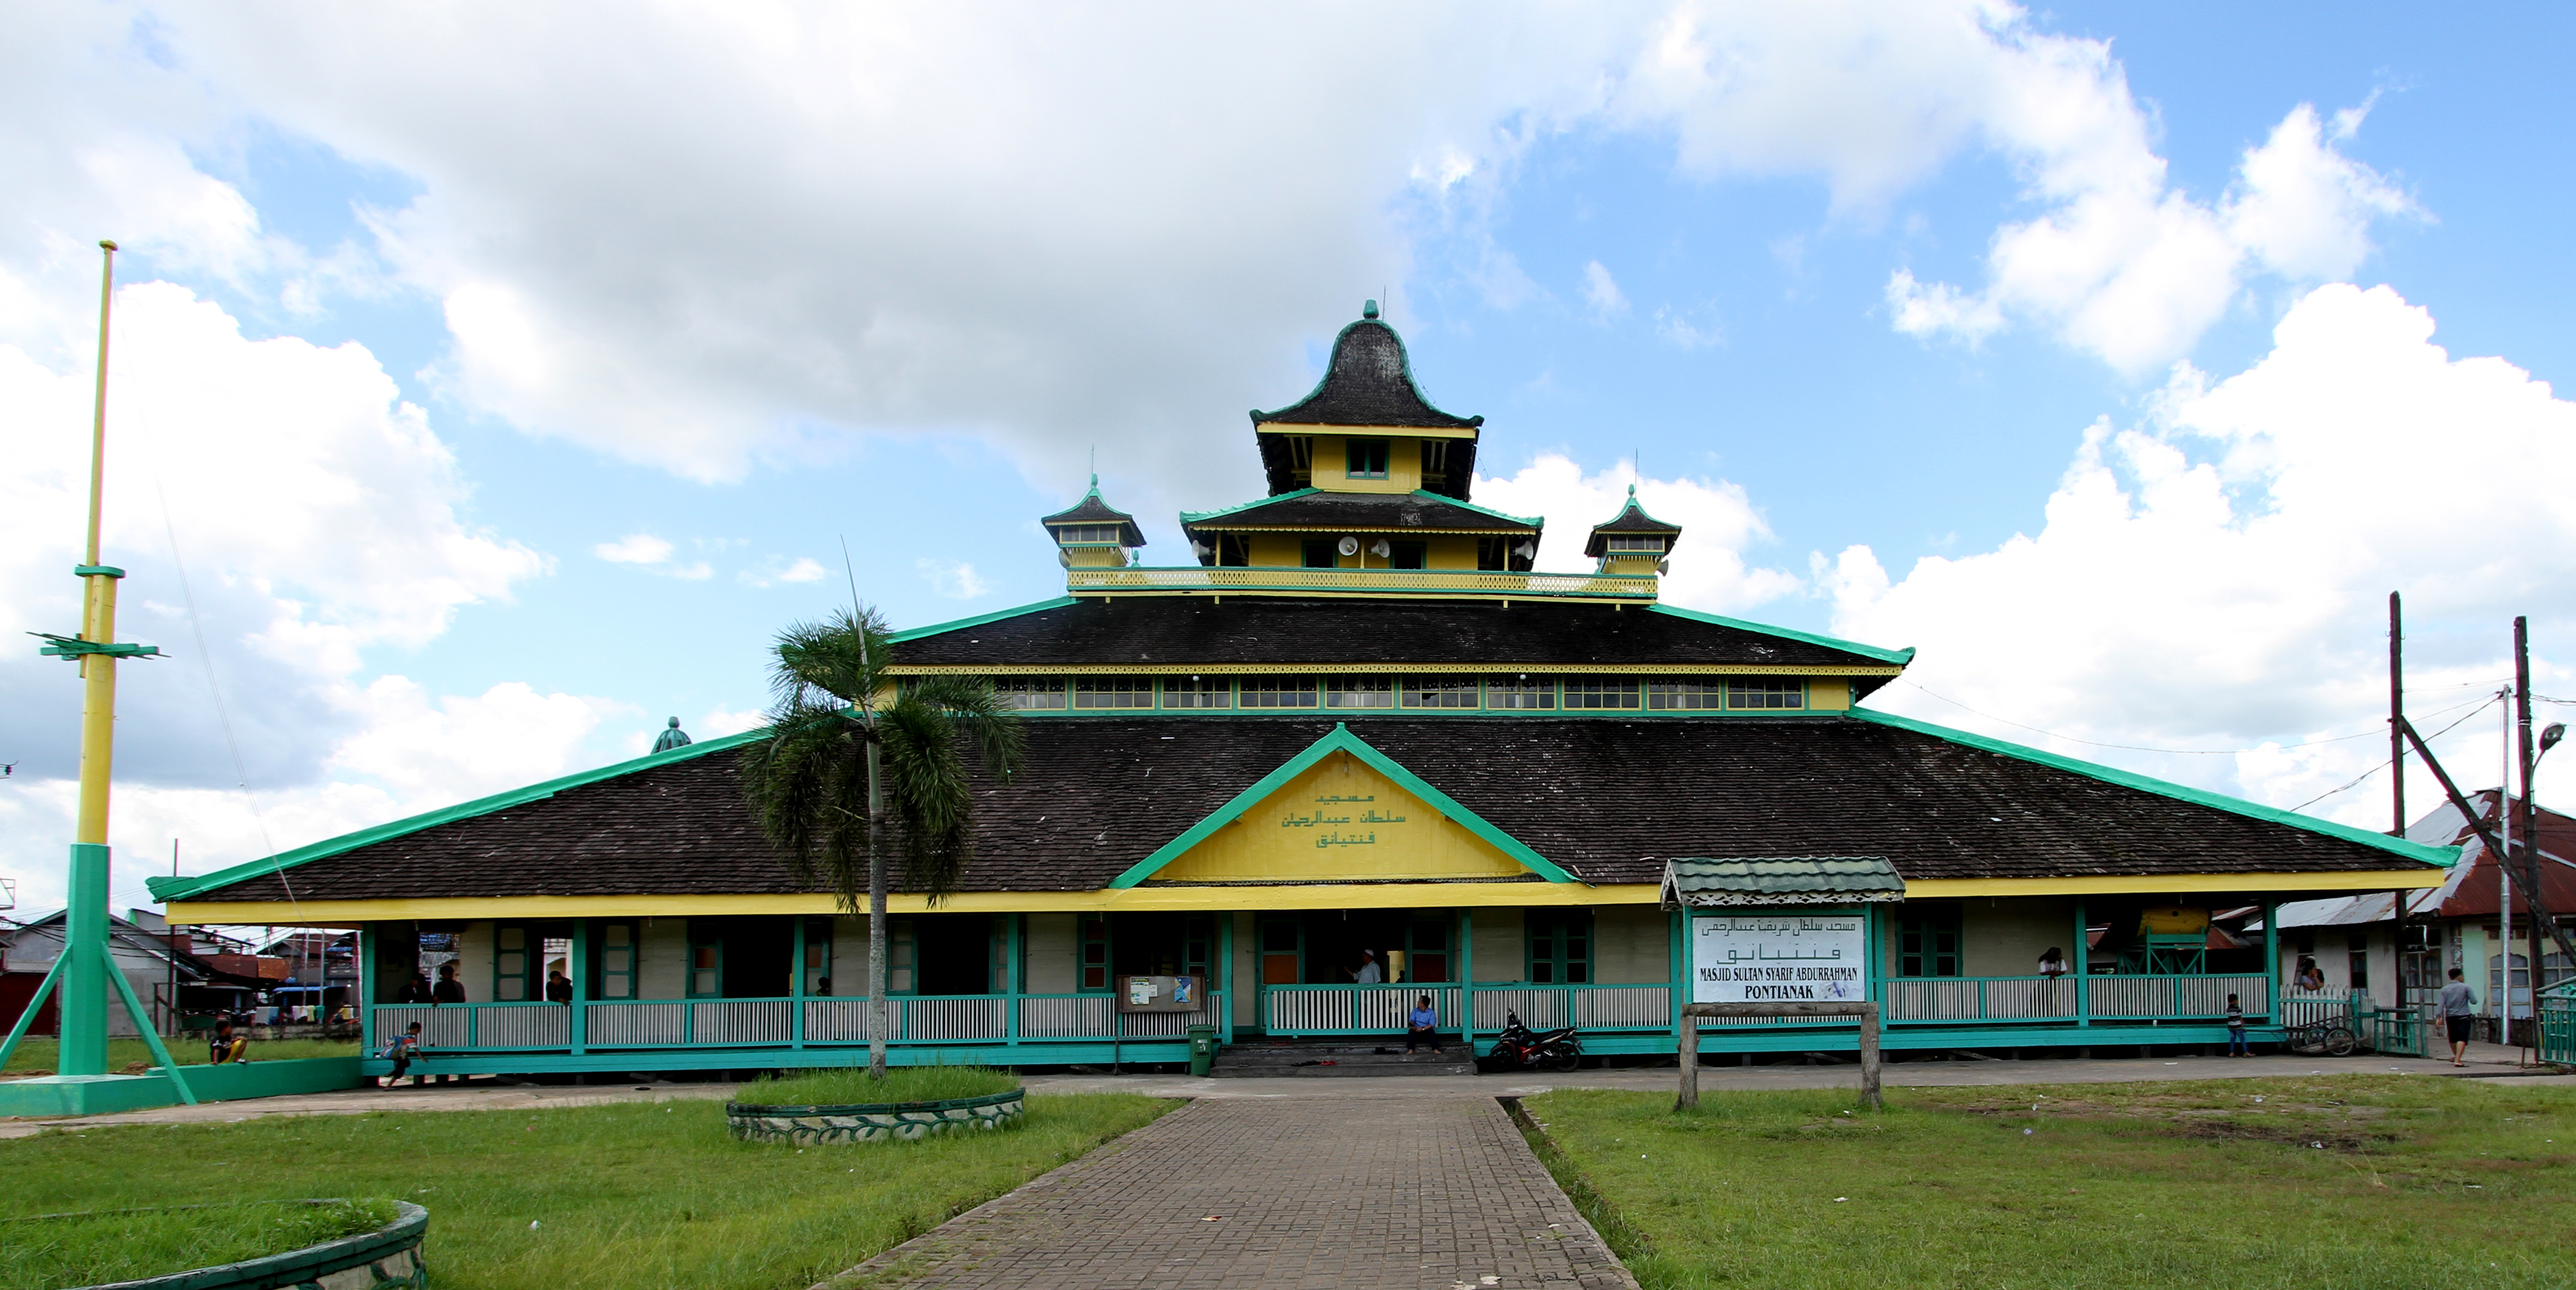 Masjid Jami Kesultanan Pontianak 1 Balai Pelestarian Cagar Budaya Makam